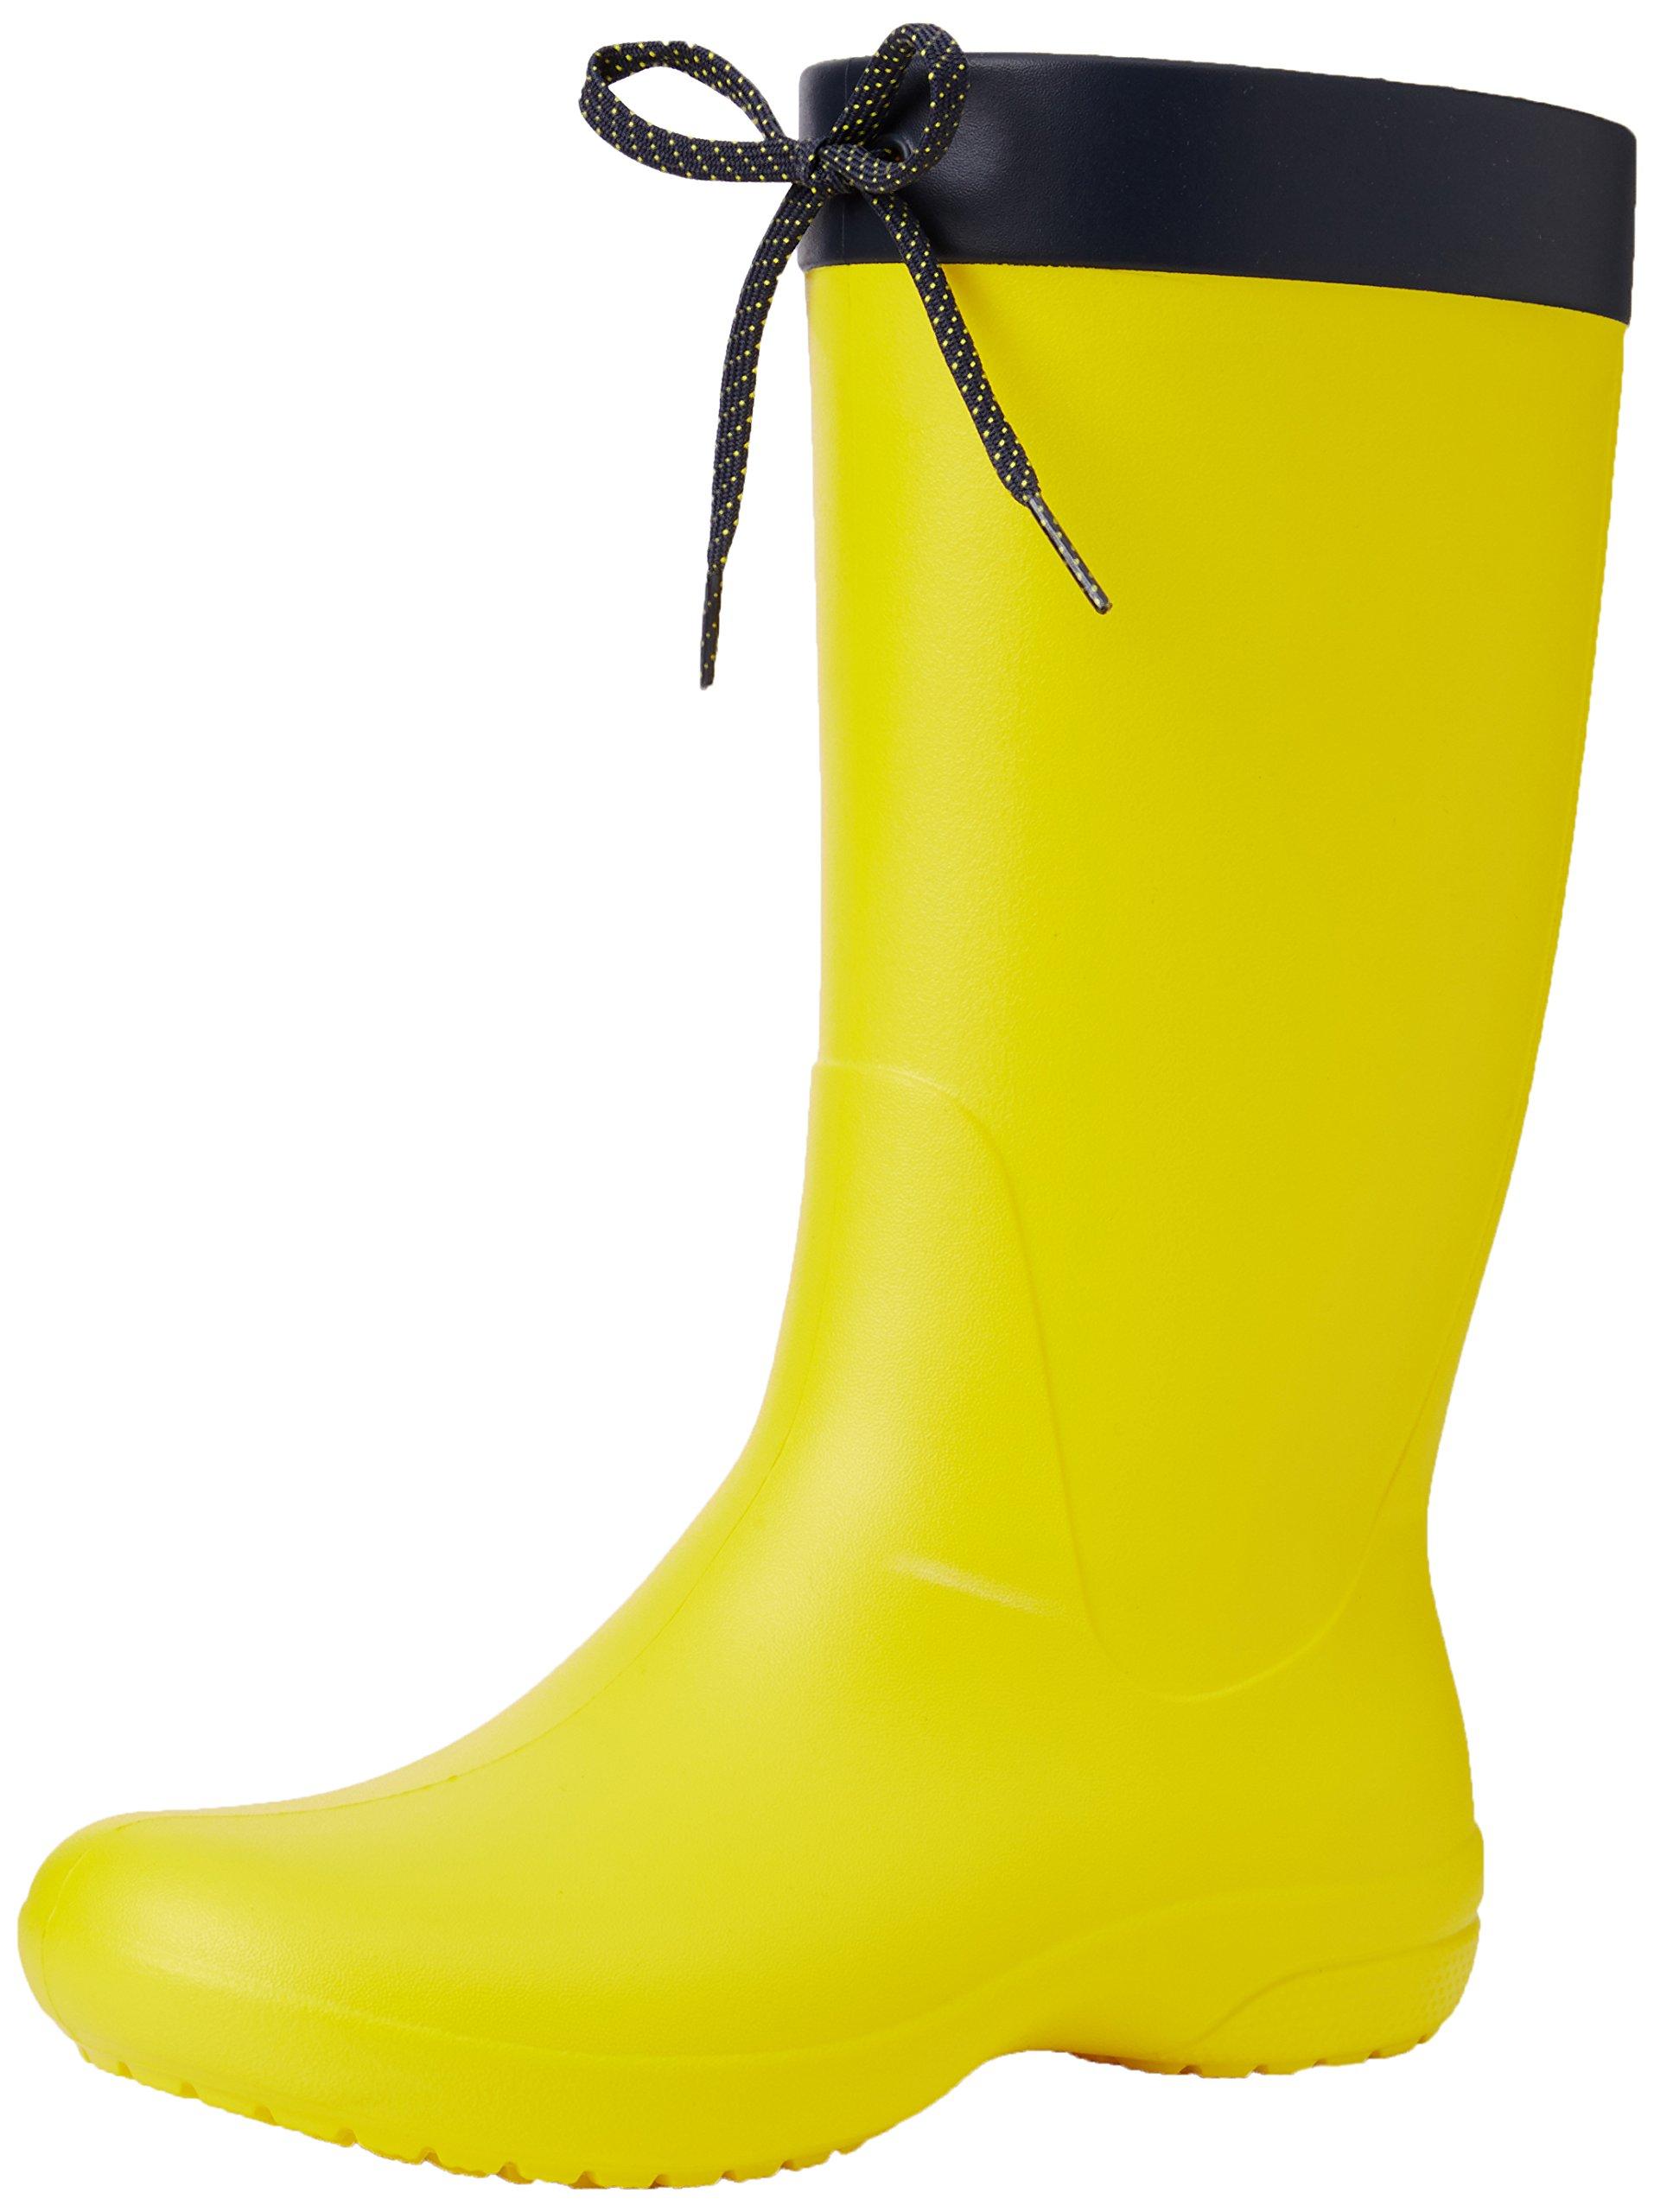 Crocs Women's Freesail Rain Boot, Lemon, 9 M US by Crocs (Image #1)